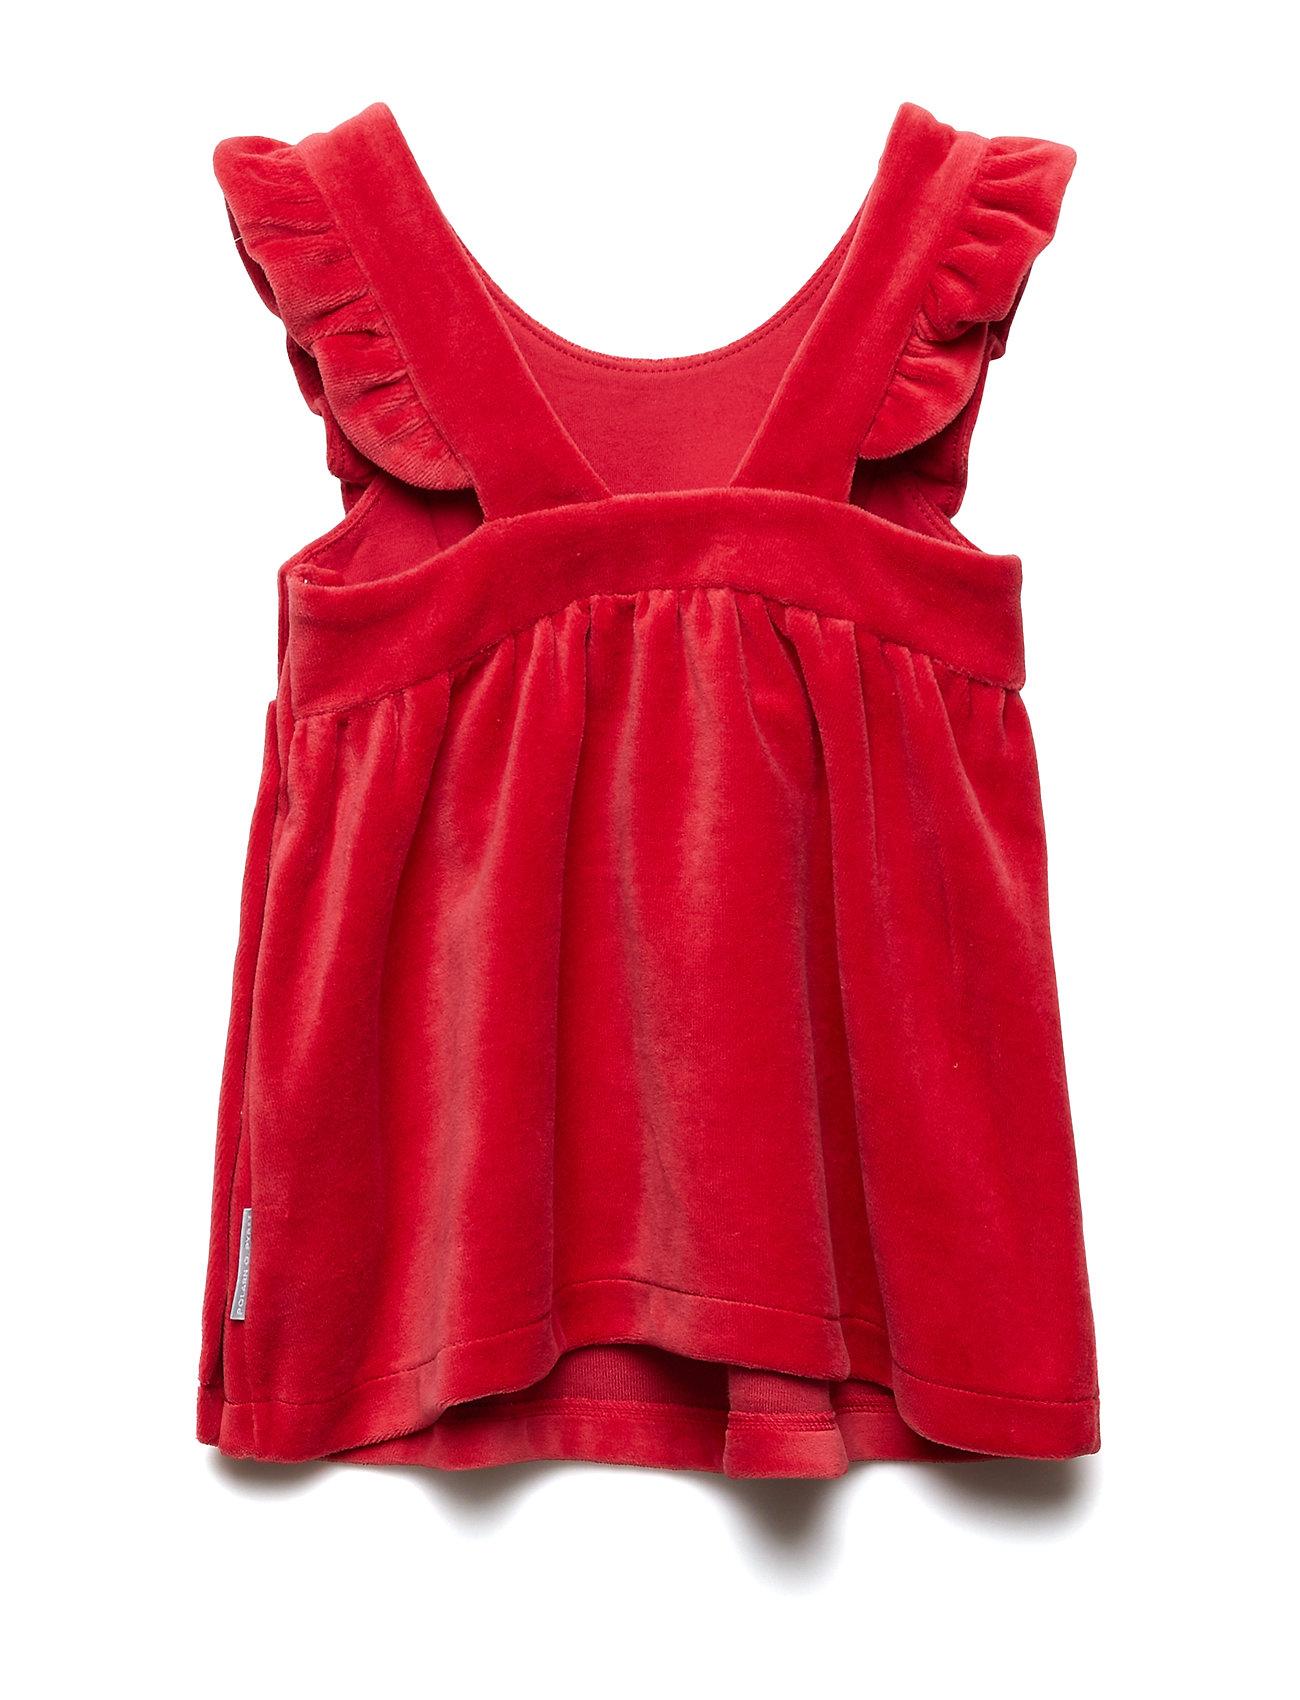 Dress SS Velour Solid Newborn Kjole Rød POLARN O. PYRET